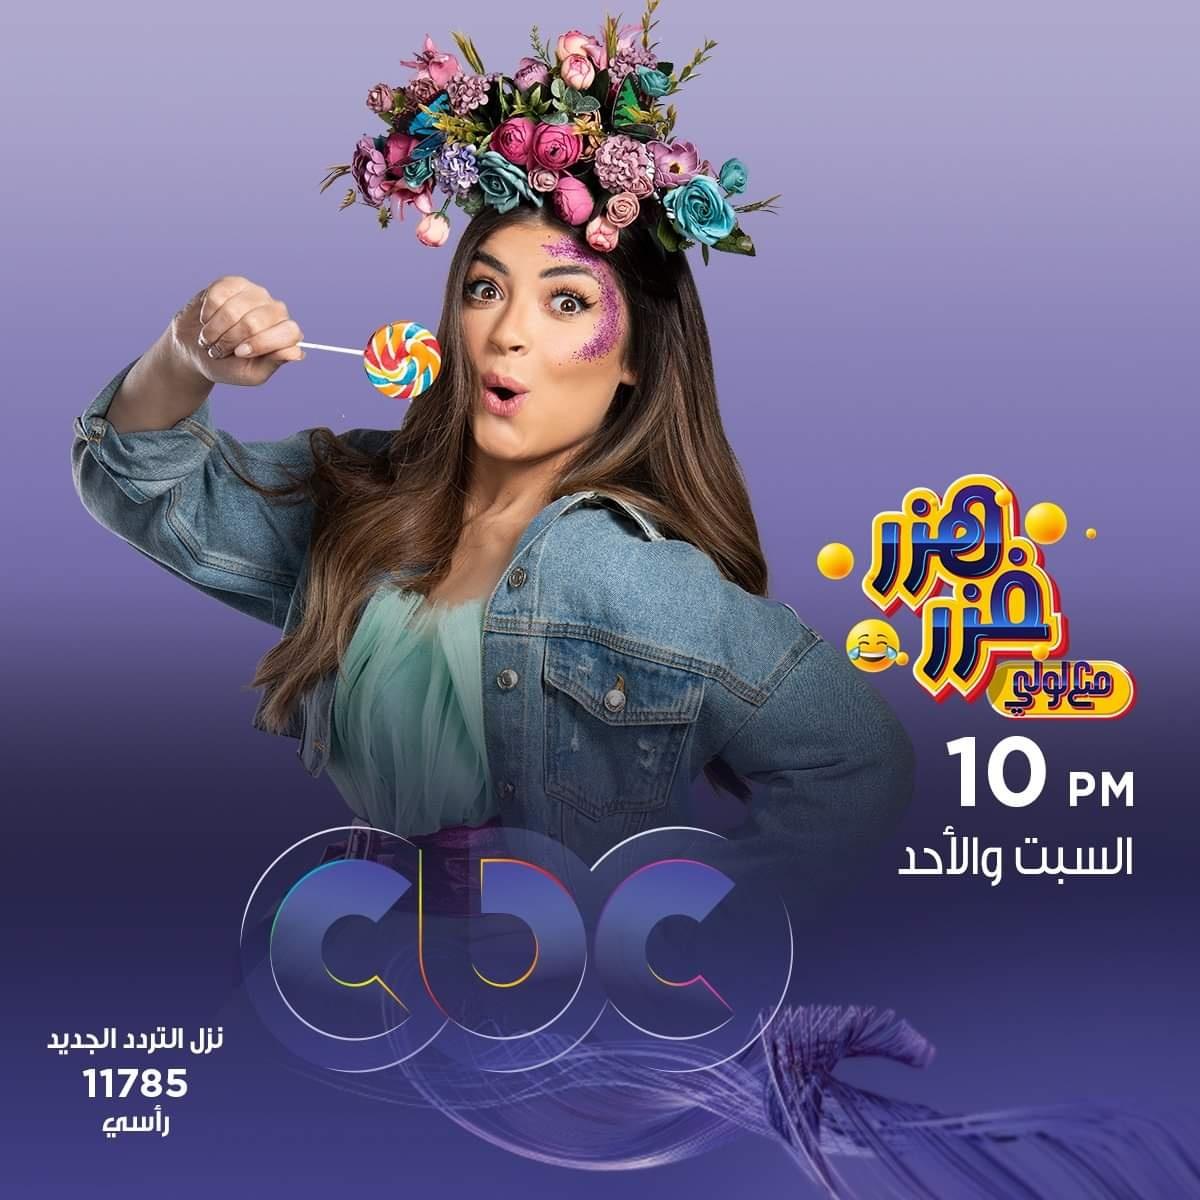 مواعيد-عرض-برنامج-هزر-فزر-ليلى-احمد-زاهر